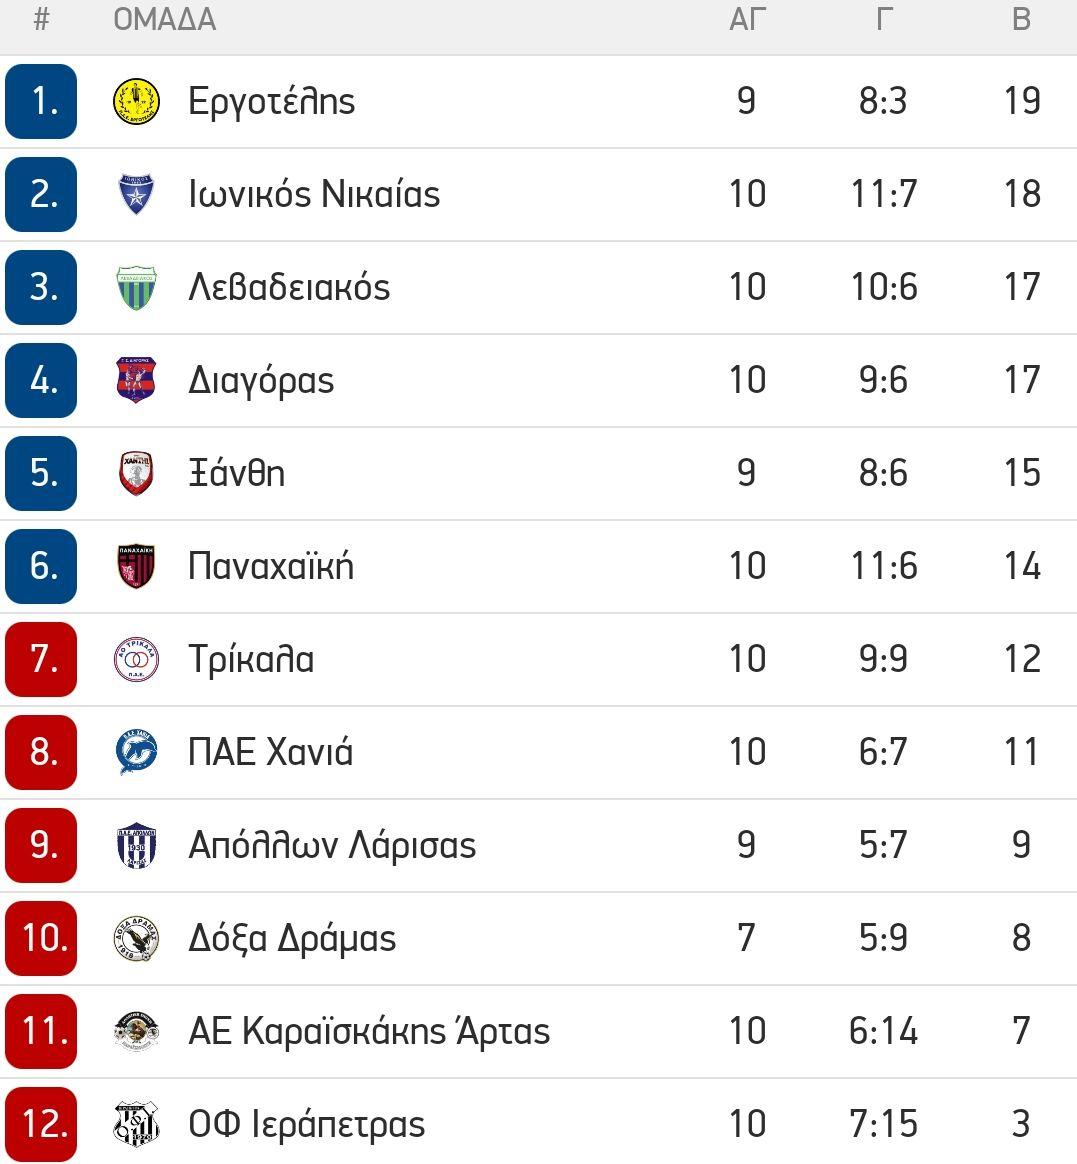 , Super League 2: Στο 1-1 Ιωνικός-Λεβαδειακός, διπλό του Διαγόρα στα Τρίκαλα (αποτελ.,σκόρερ, βαθμολογία)